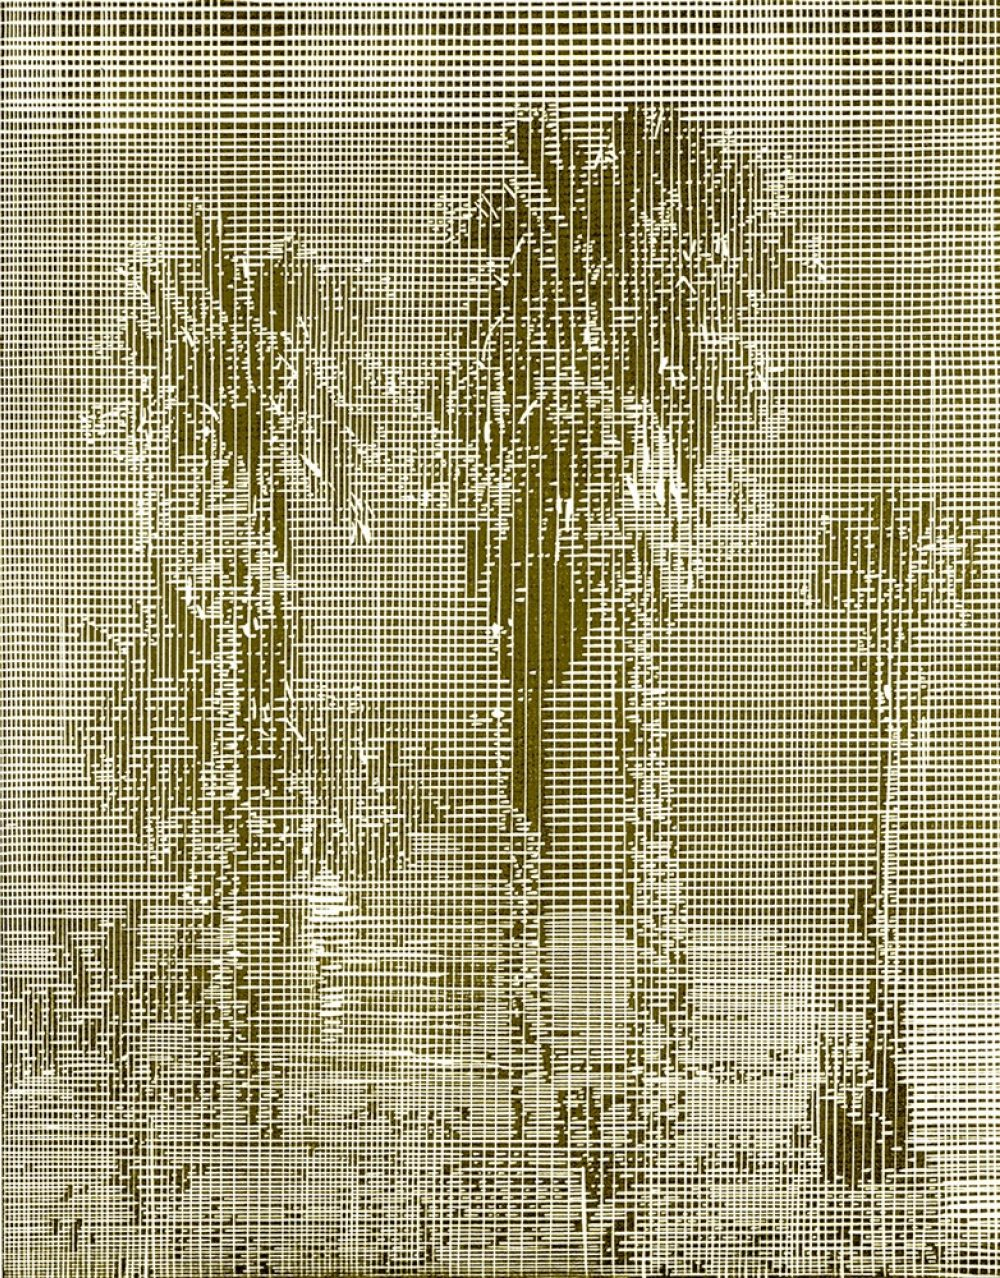 Lese (2018), linocut, 27 x 21 cm